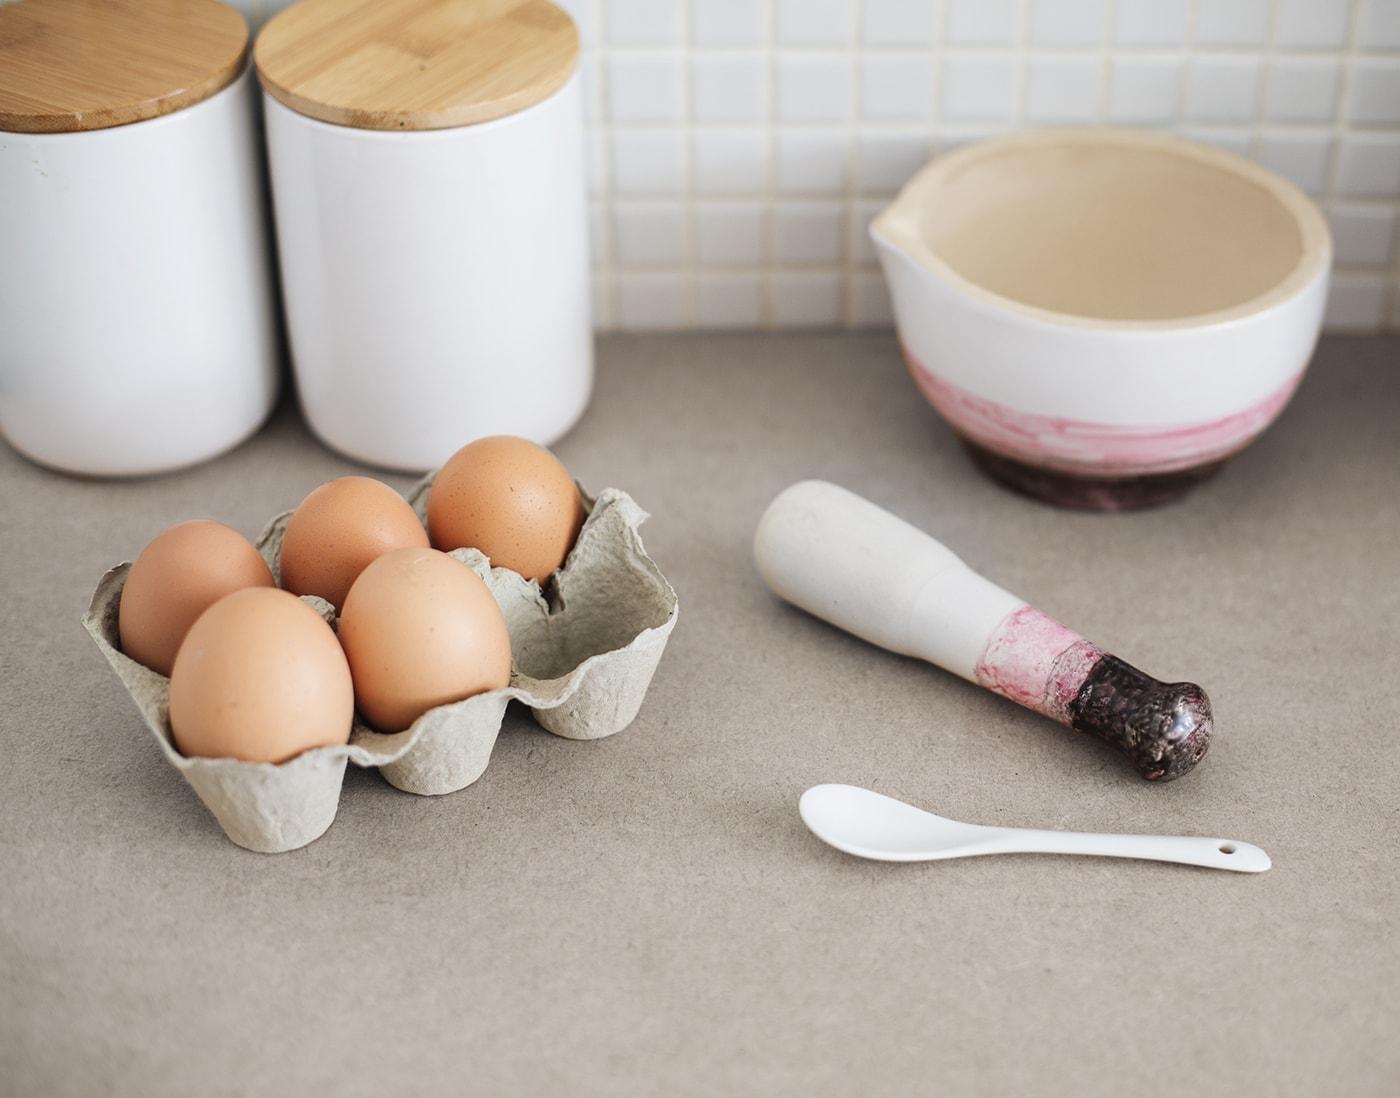 dip dye effect pestal & mortar bowl | home crafts for the kitchen | porcelain paint